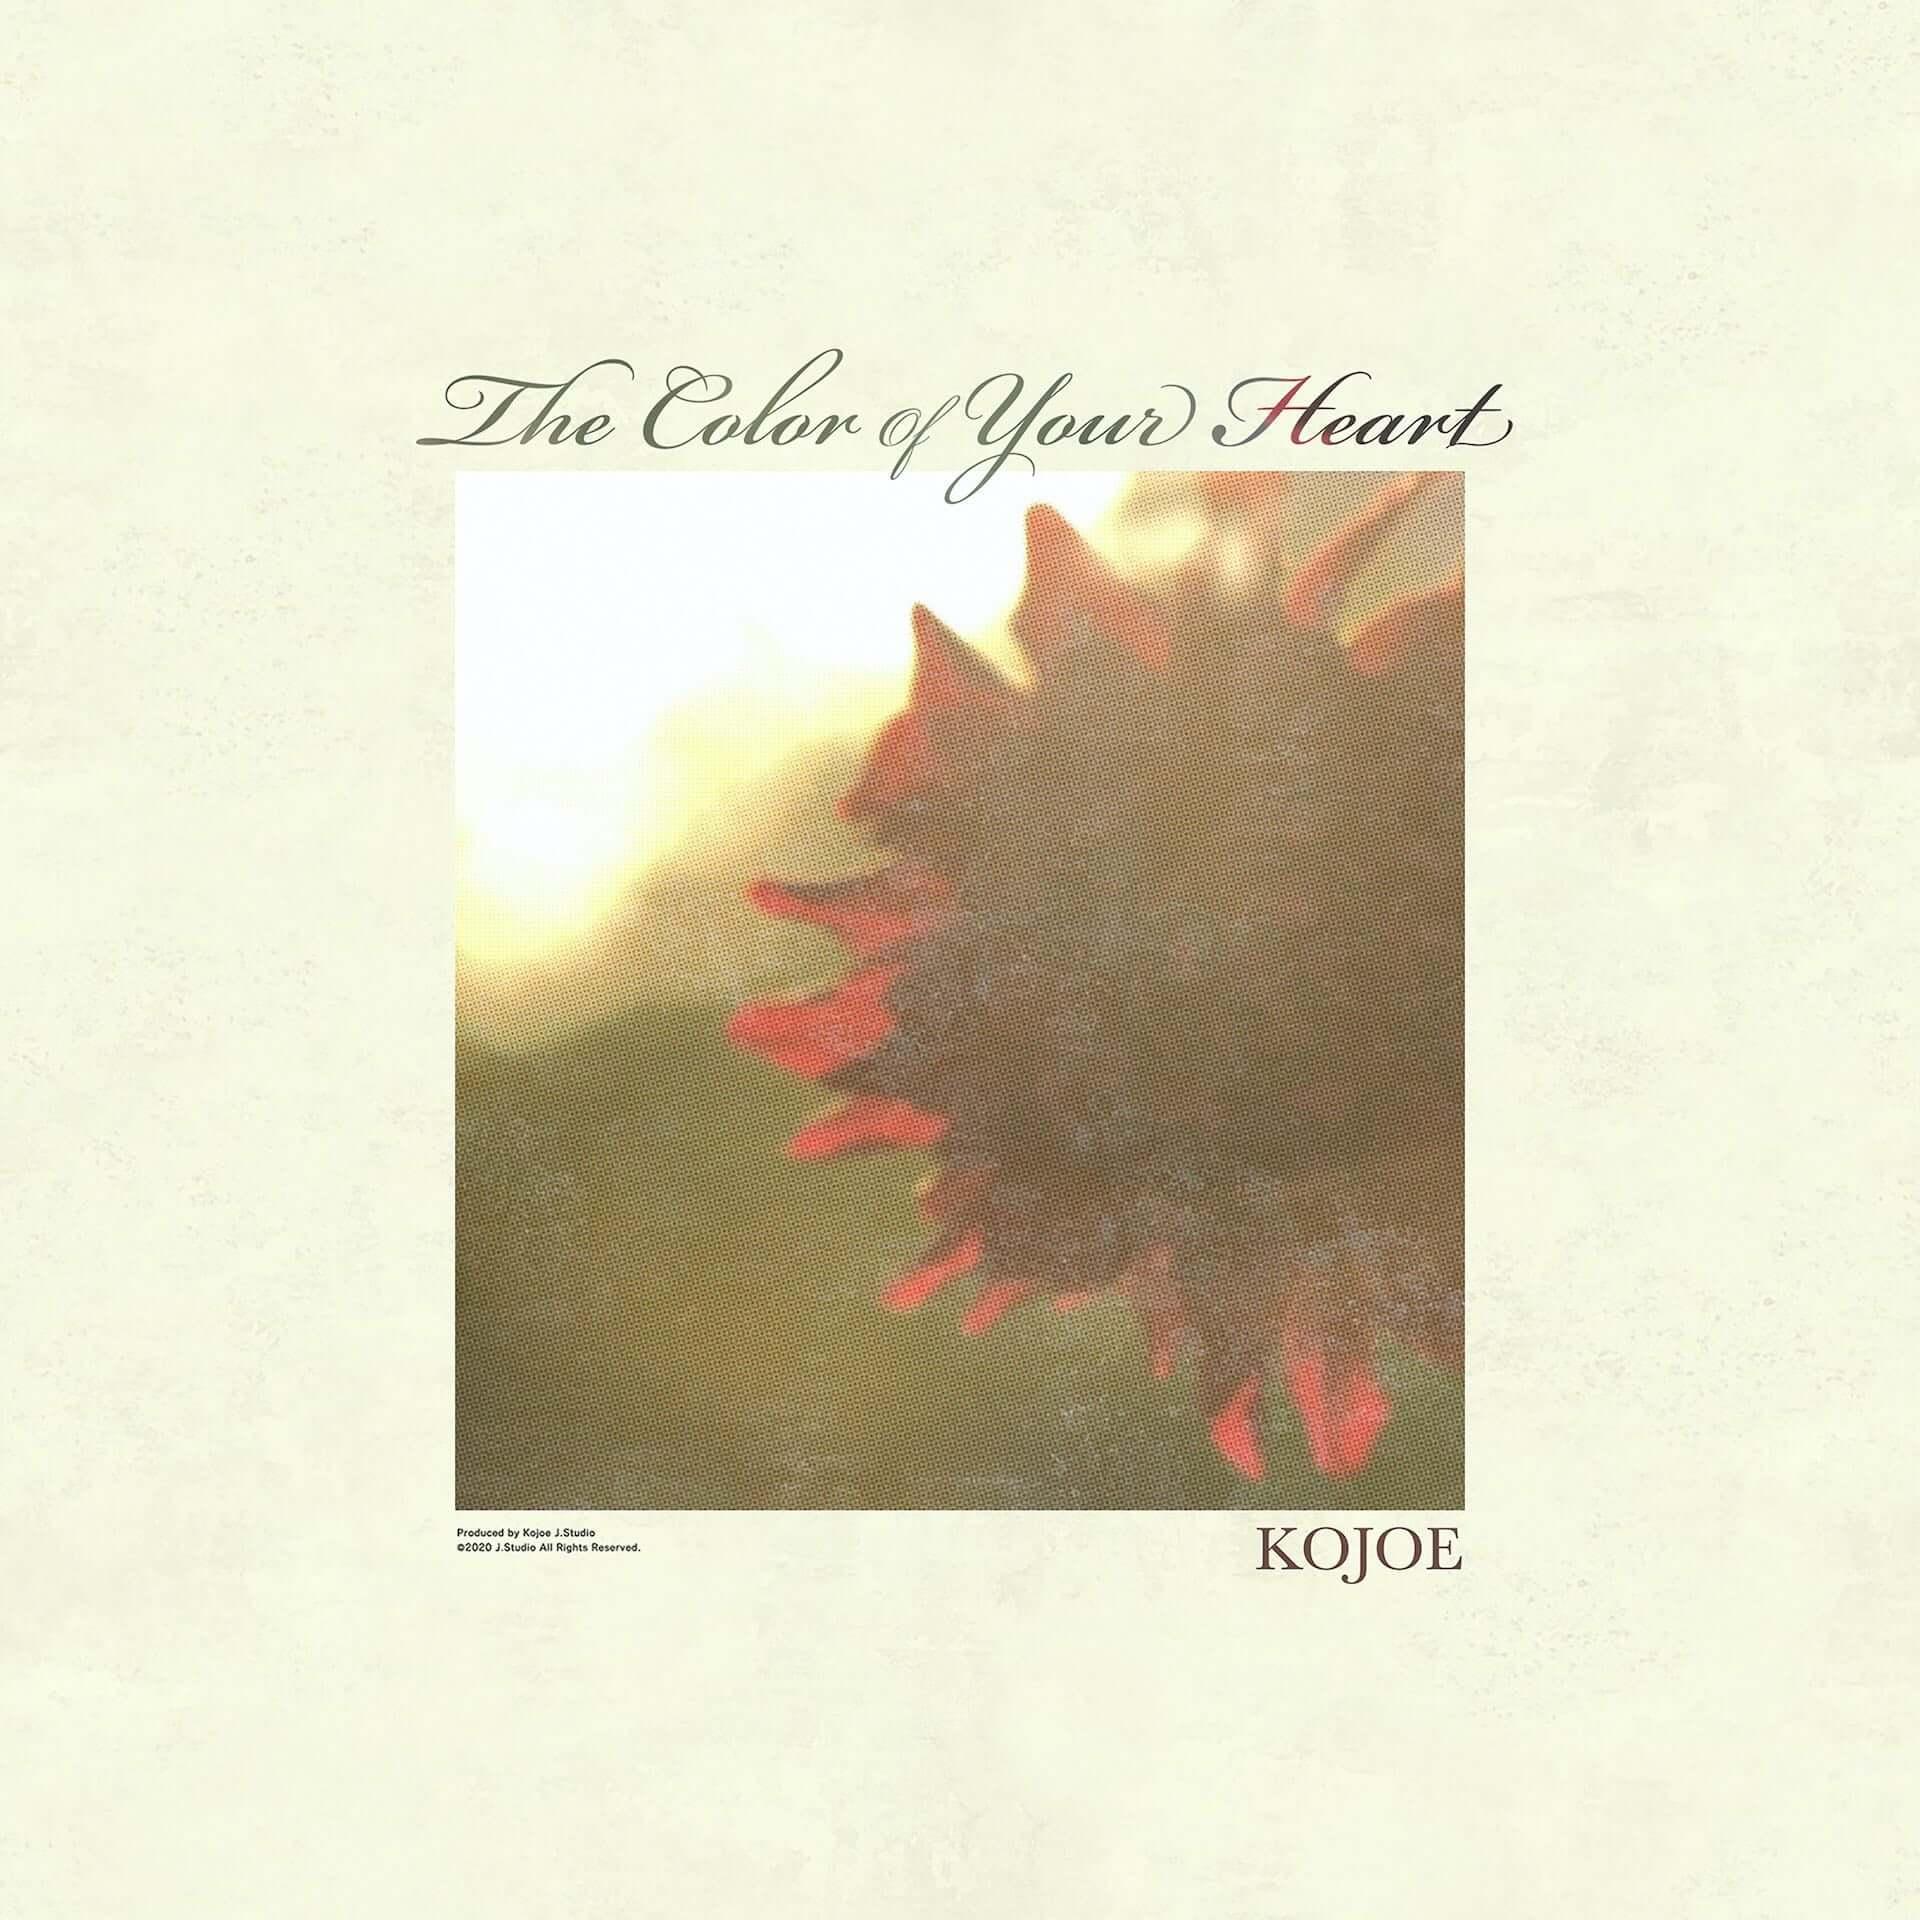 KOJOEが最新ビートテープ・アルバム『The Color of Your Heart』をリリース!自身が撮影した約30分の映像作品も公開 music210217_kojoe_2-1920x1920